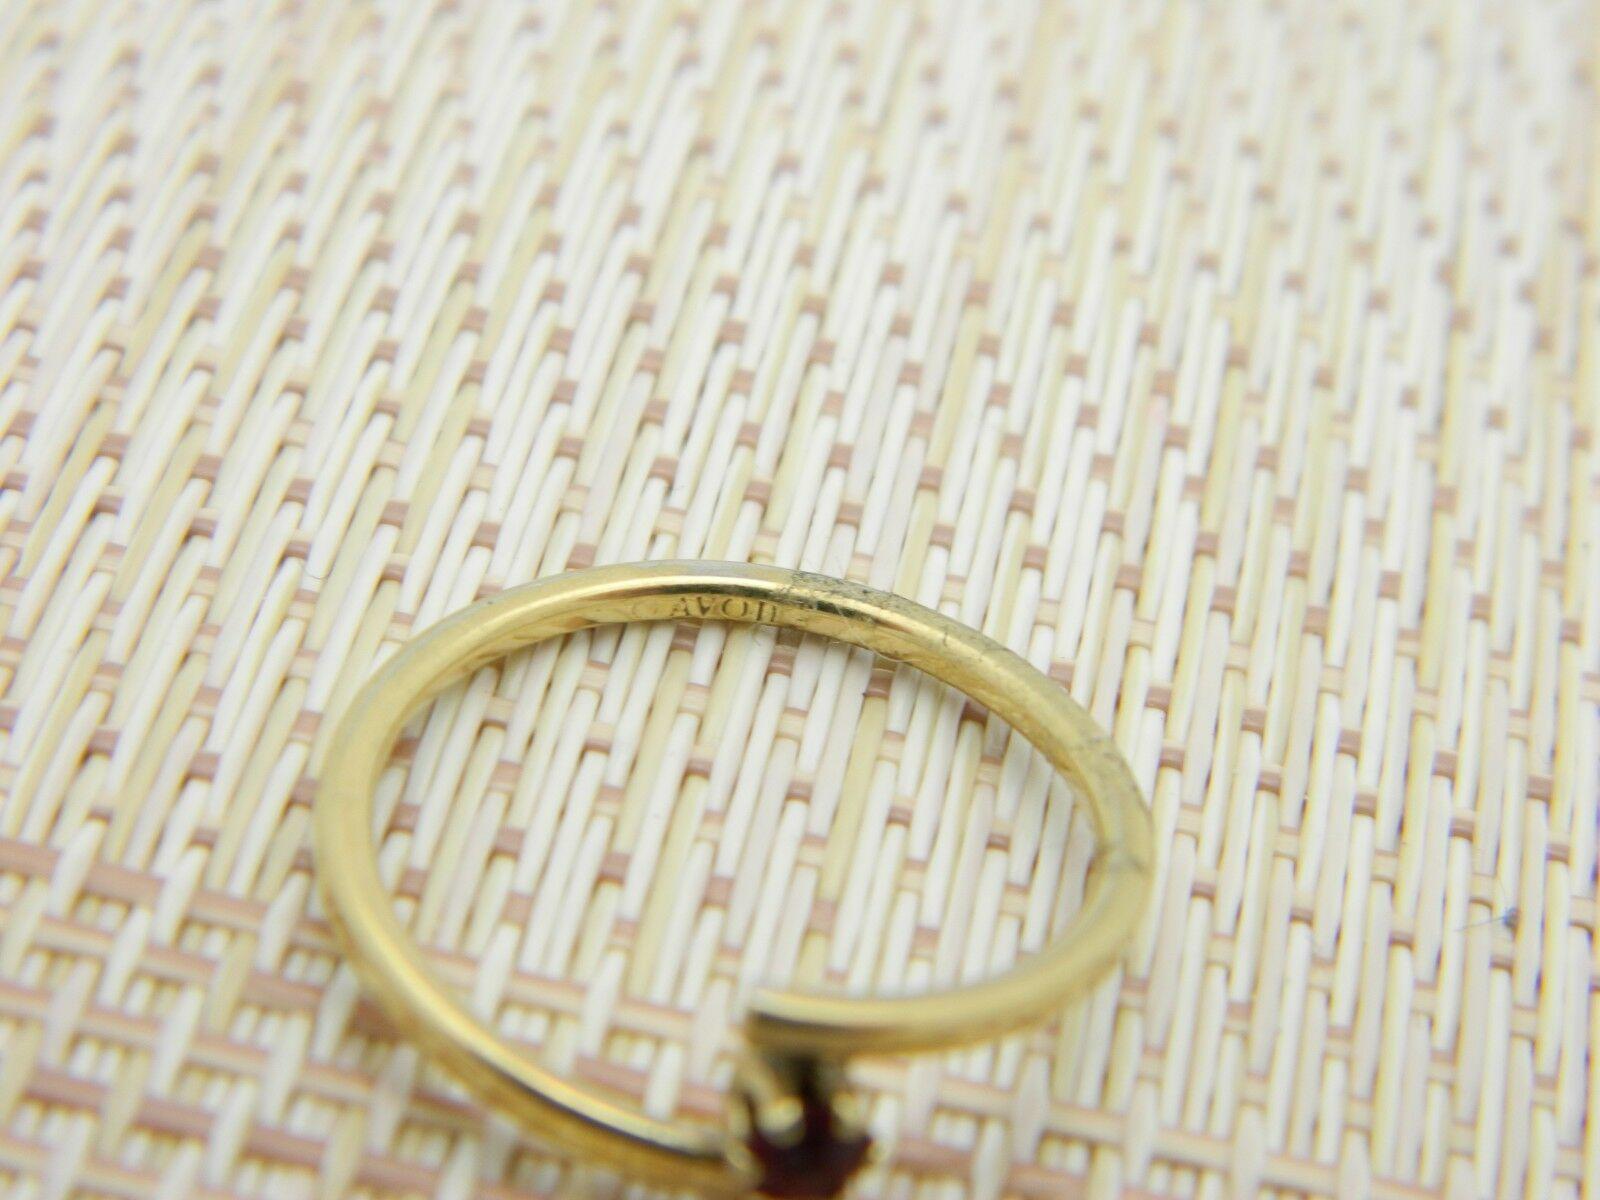 AVON Gold Tone Red Rhinestone Dainty Ring Adjustable Size 7.25 Vintage image 5